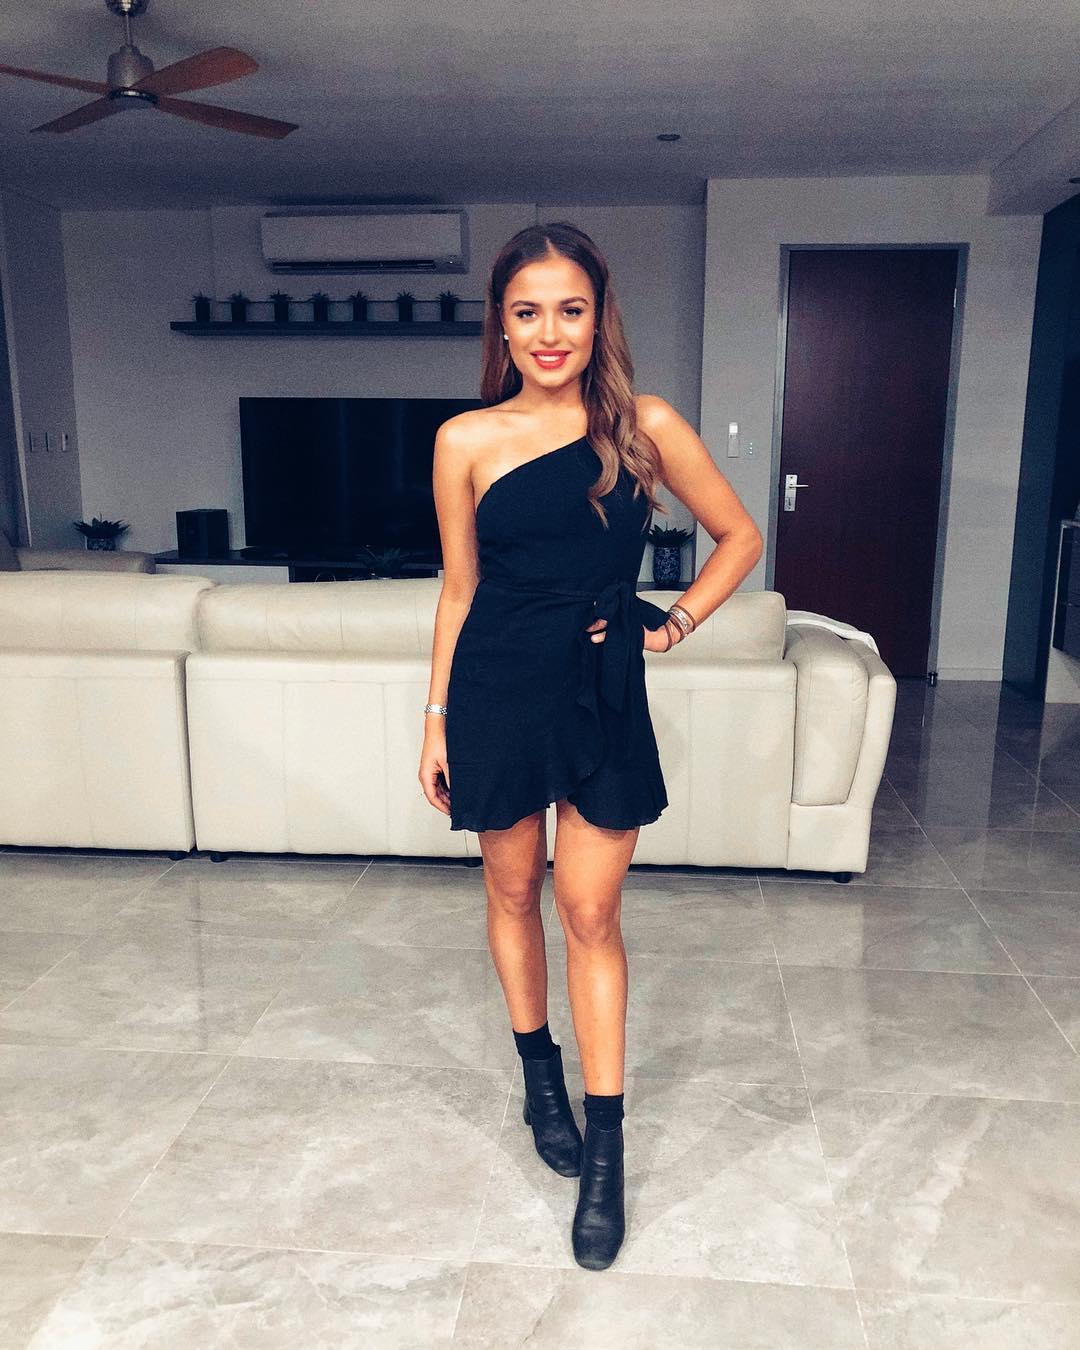 candidatas a miss world australia 2018. final: 31 agosto. - Página 17 Roe75a4q